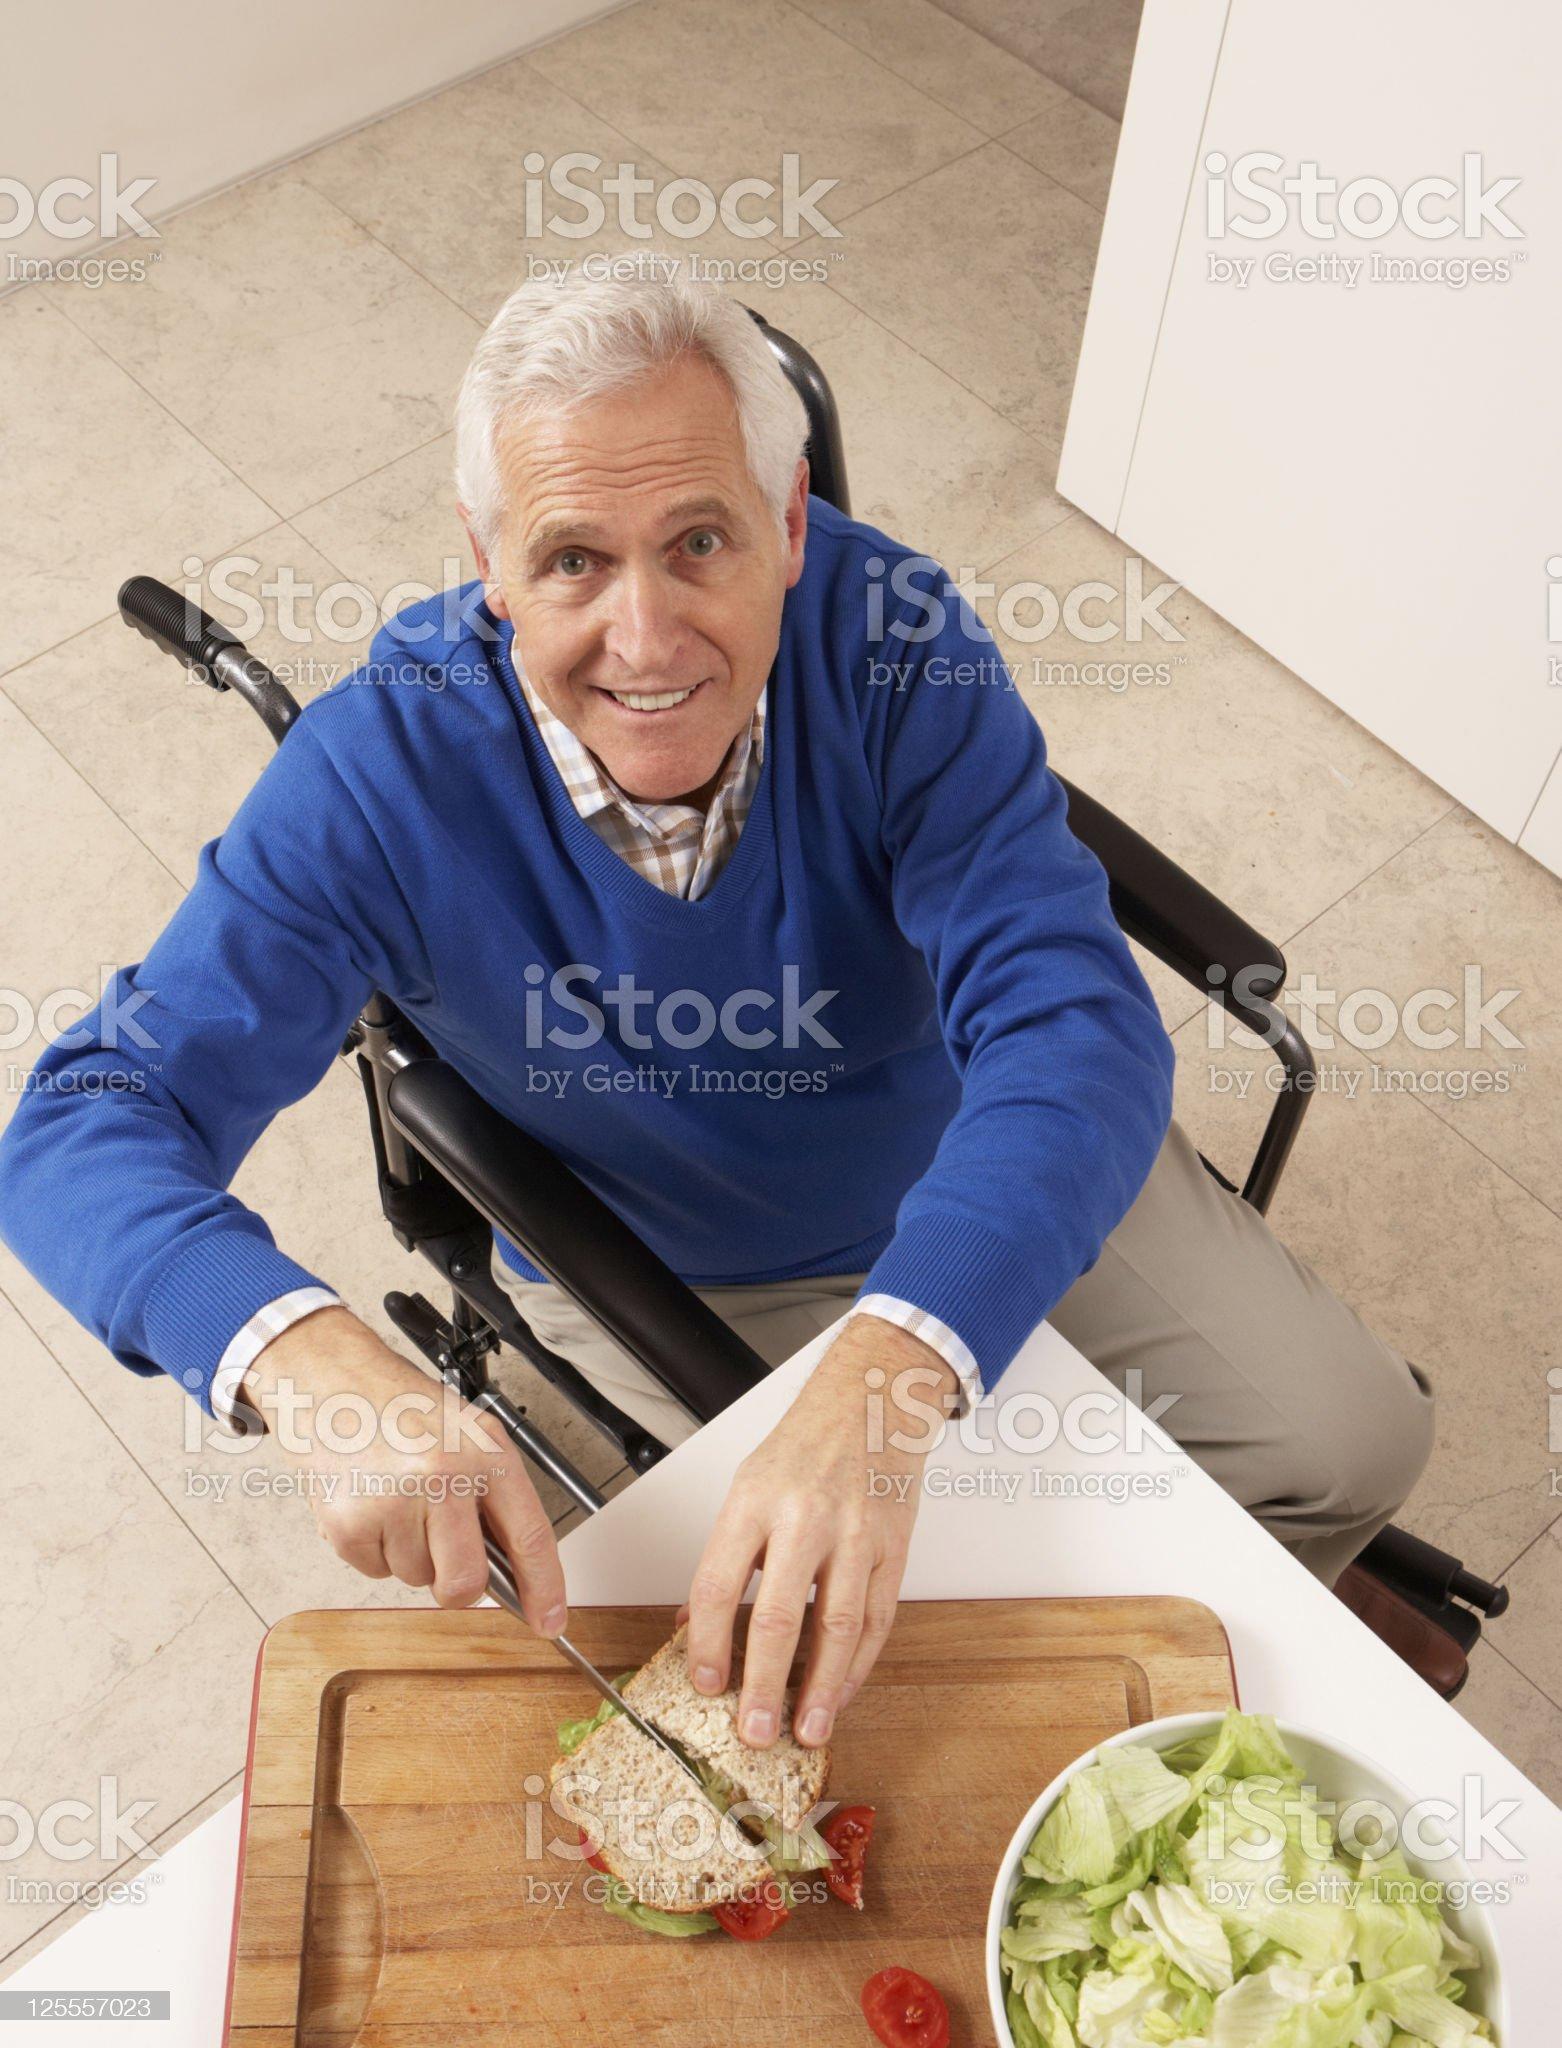 Disabled senior man cutting sandwich on cutting board royalty-free stock photo